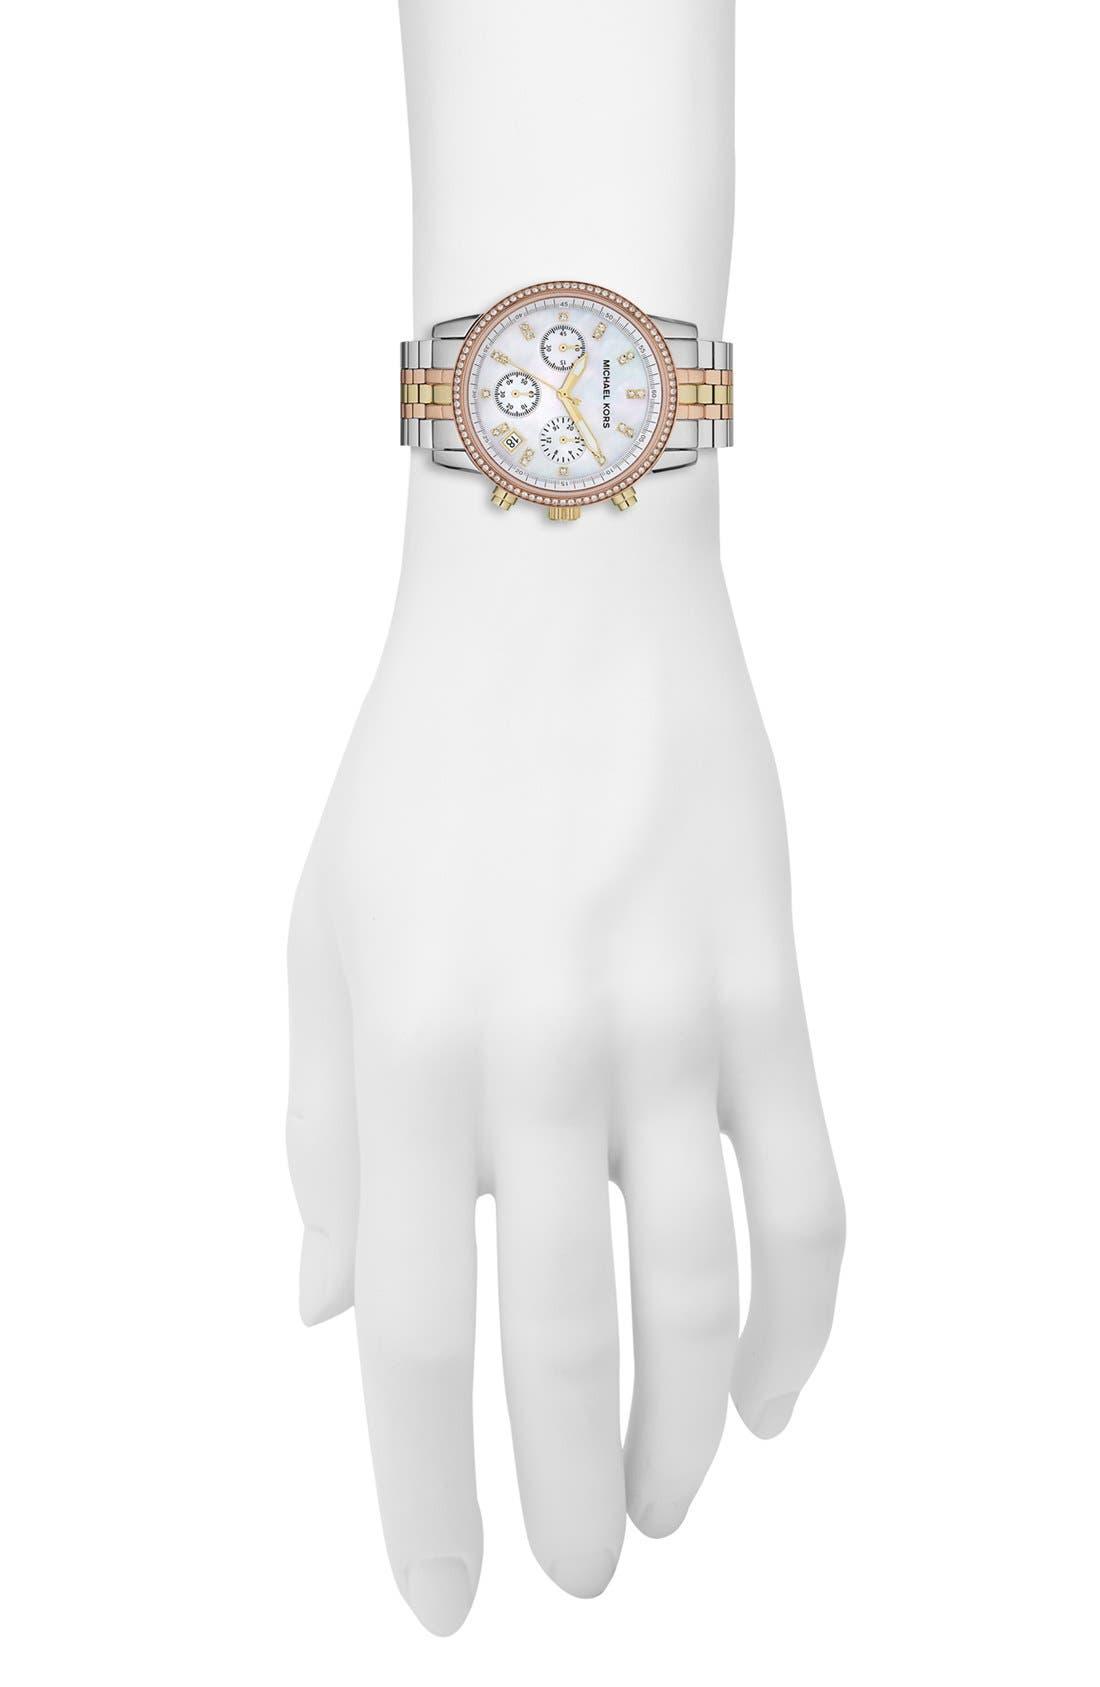 Michael Kors 'Ritz' Chronograph Bracelet Watch, 36mm,                             Alternate thumbnail 3, color,                             040